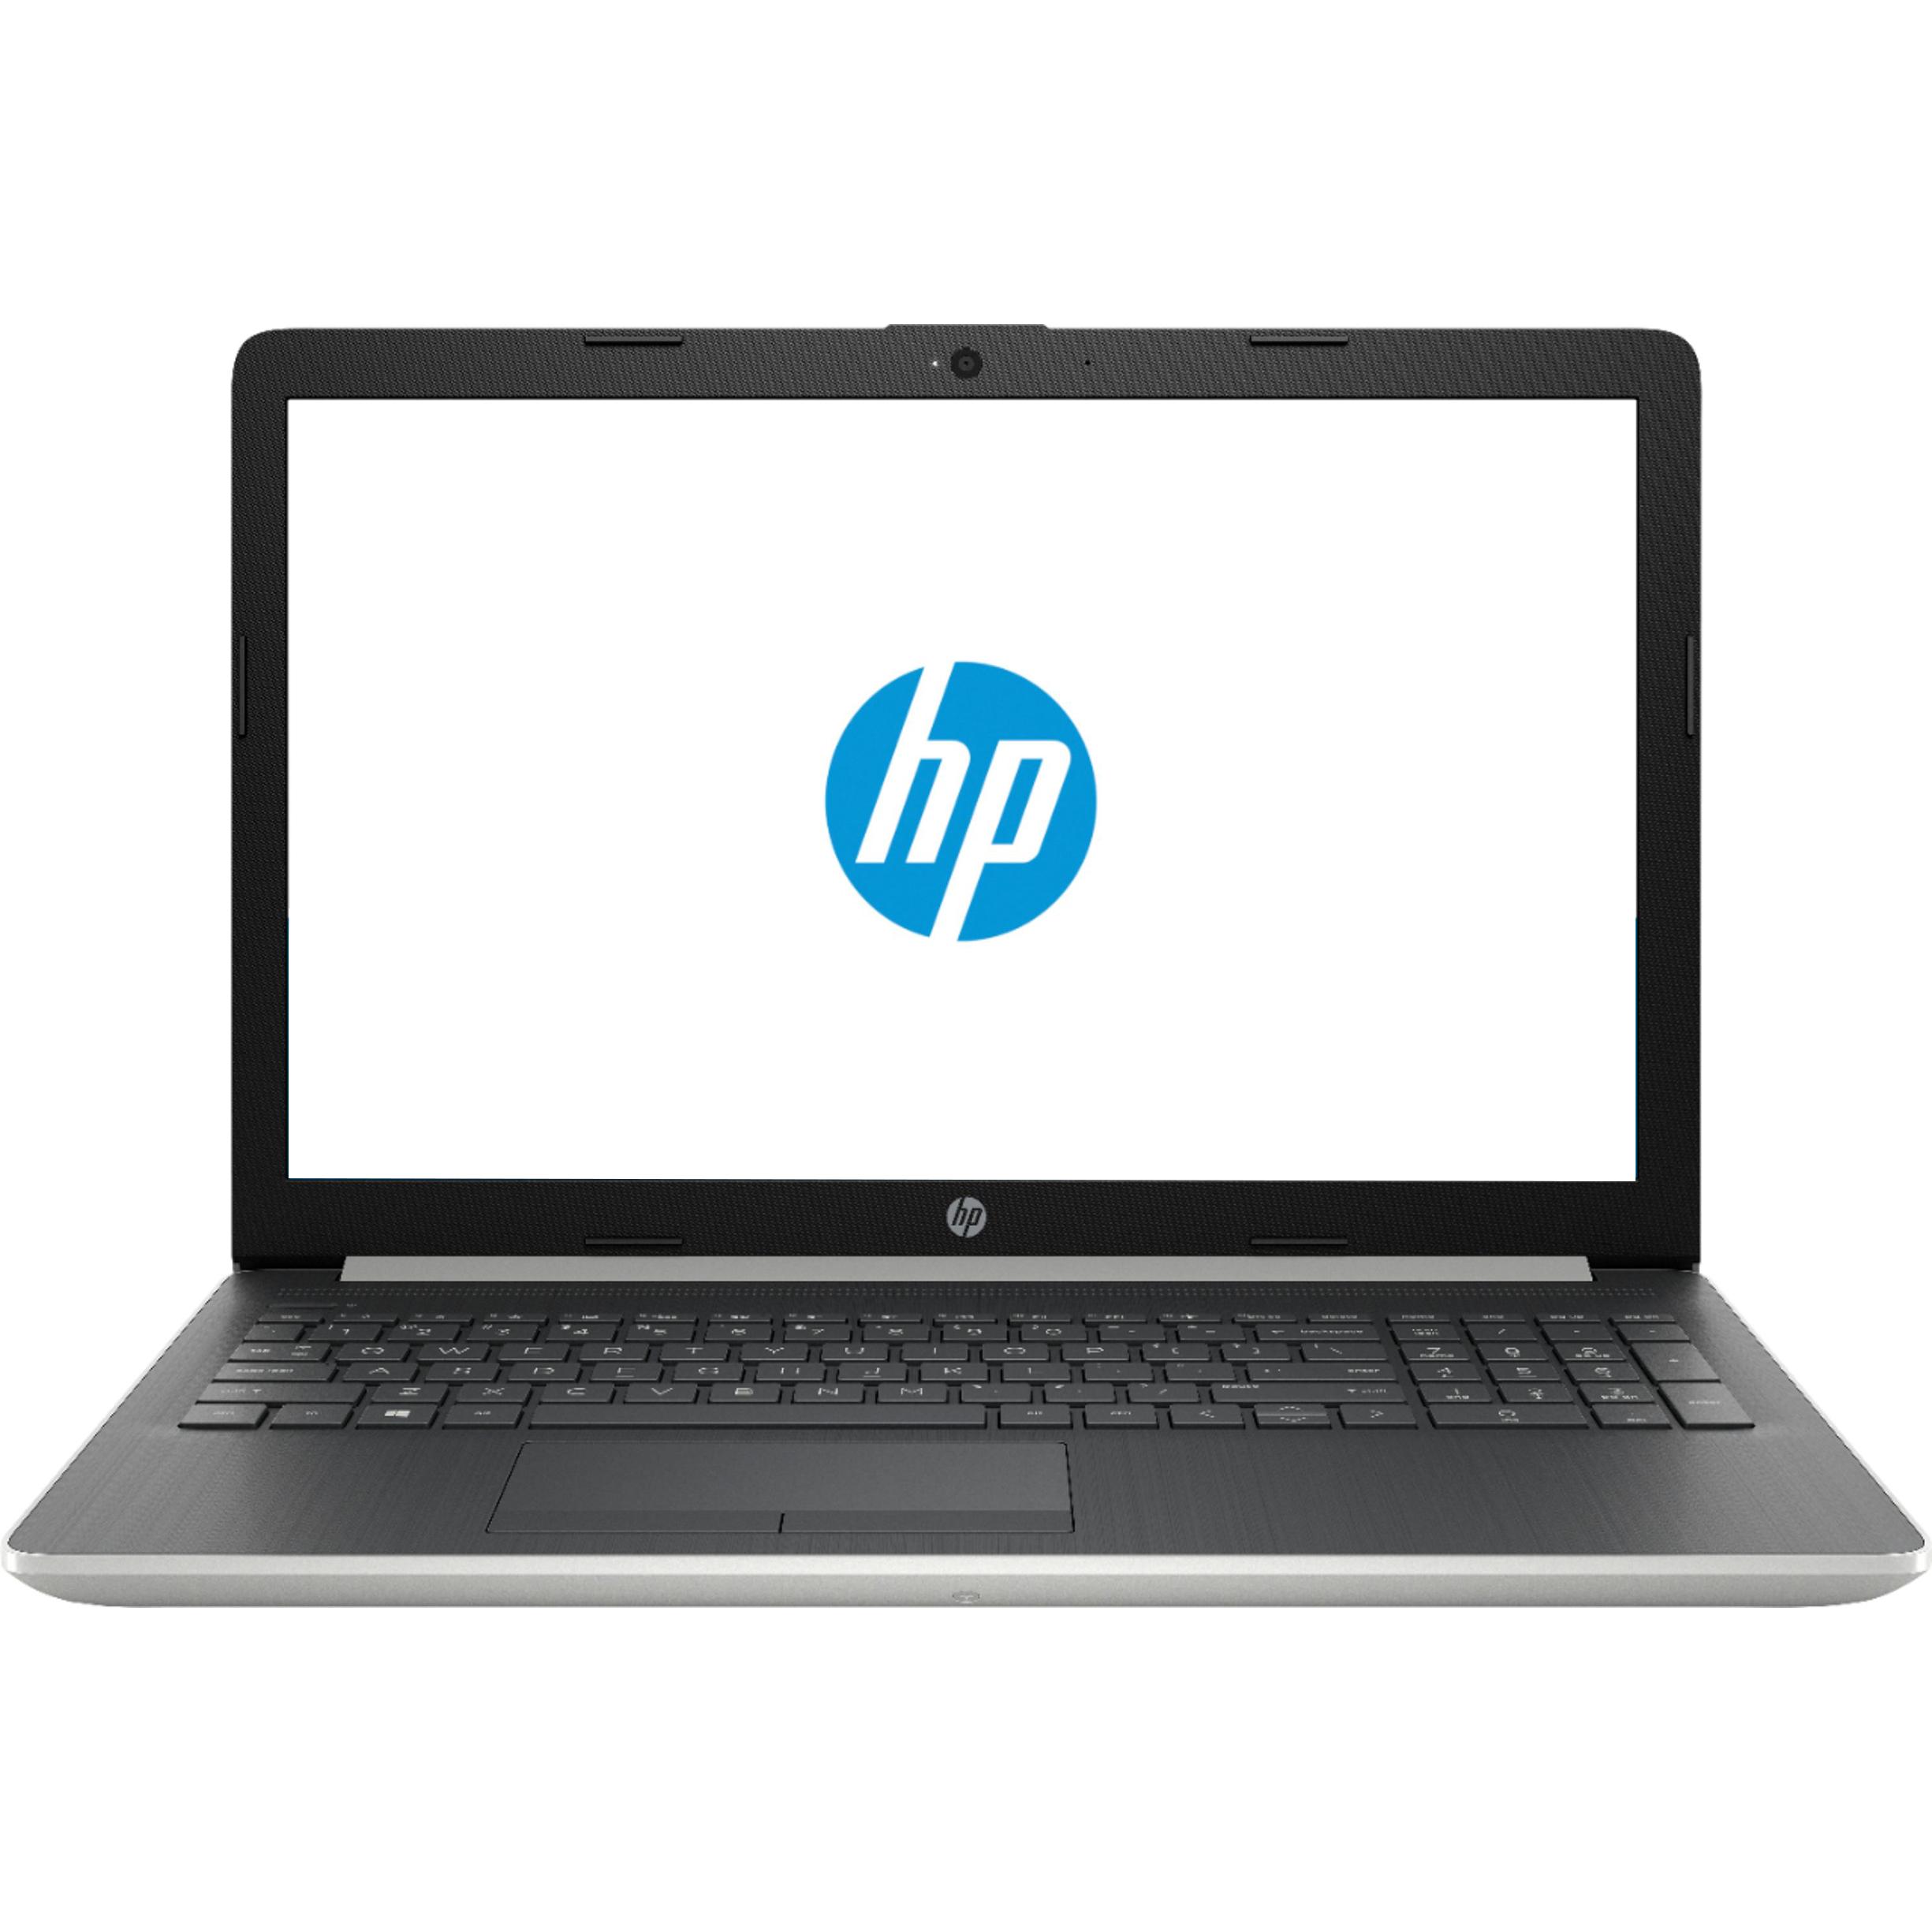 لپ تاپ 15 اینچی اچ پی مدل DA0115-G